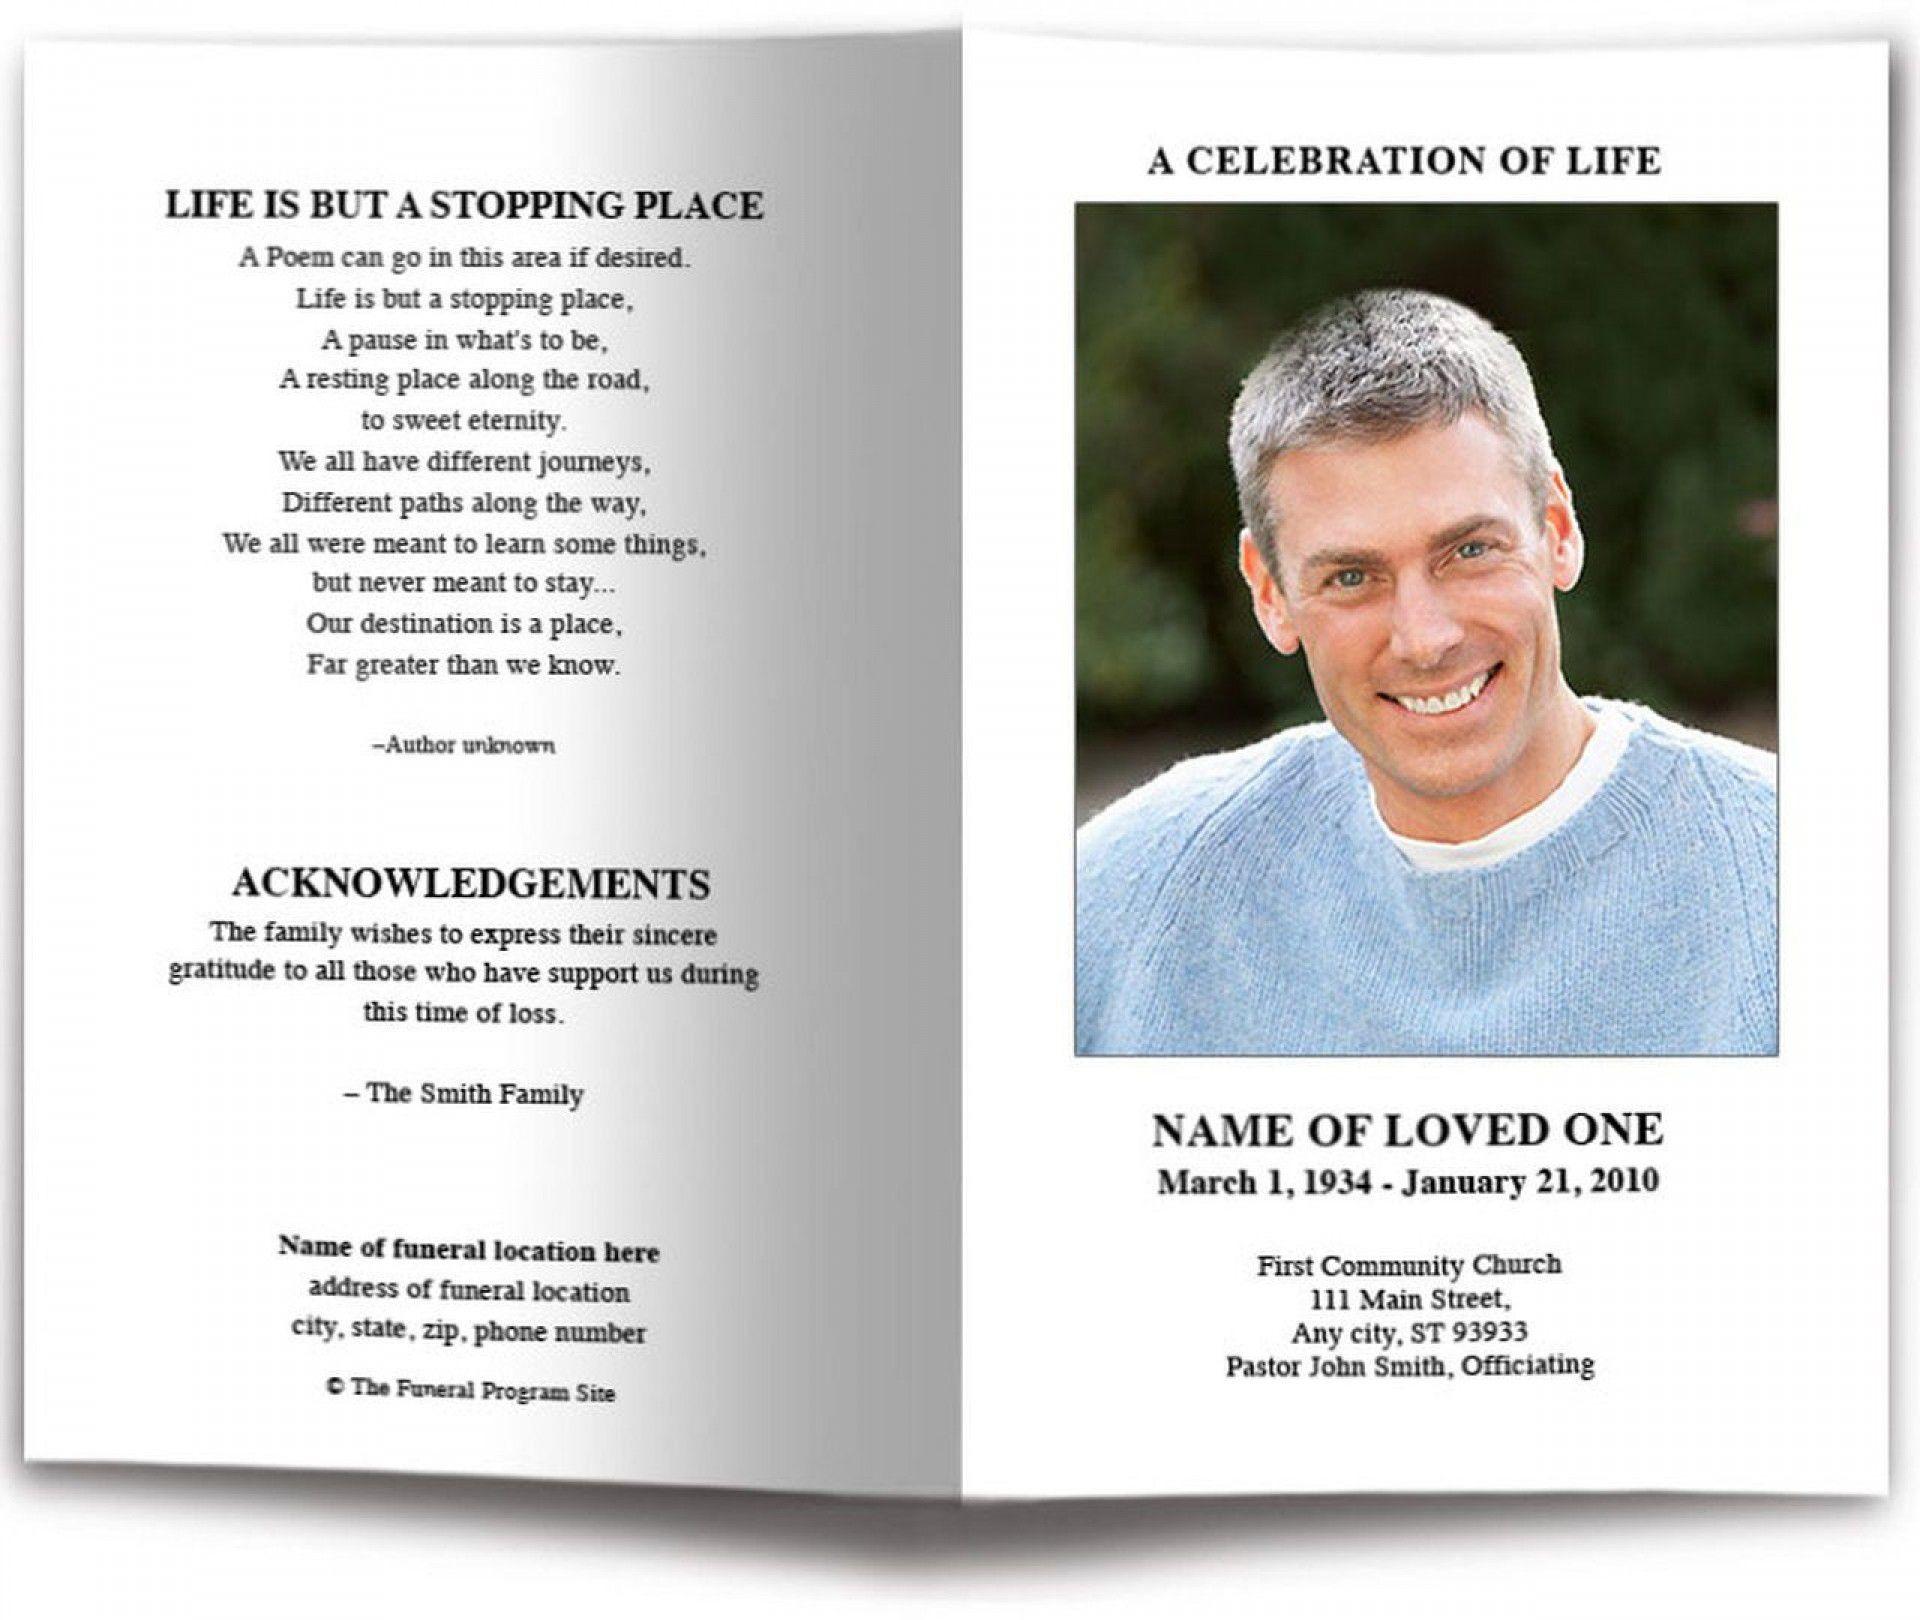 002 Wonderful Funeral Program Template Free High Def  Online Printable Download Publisher1920